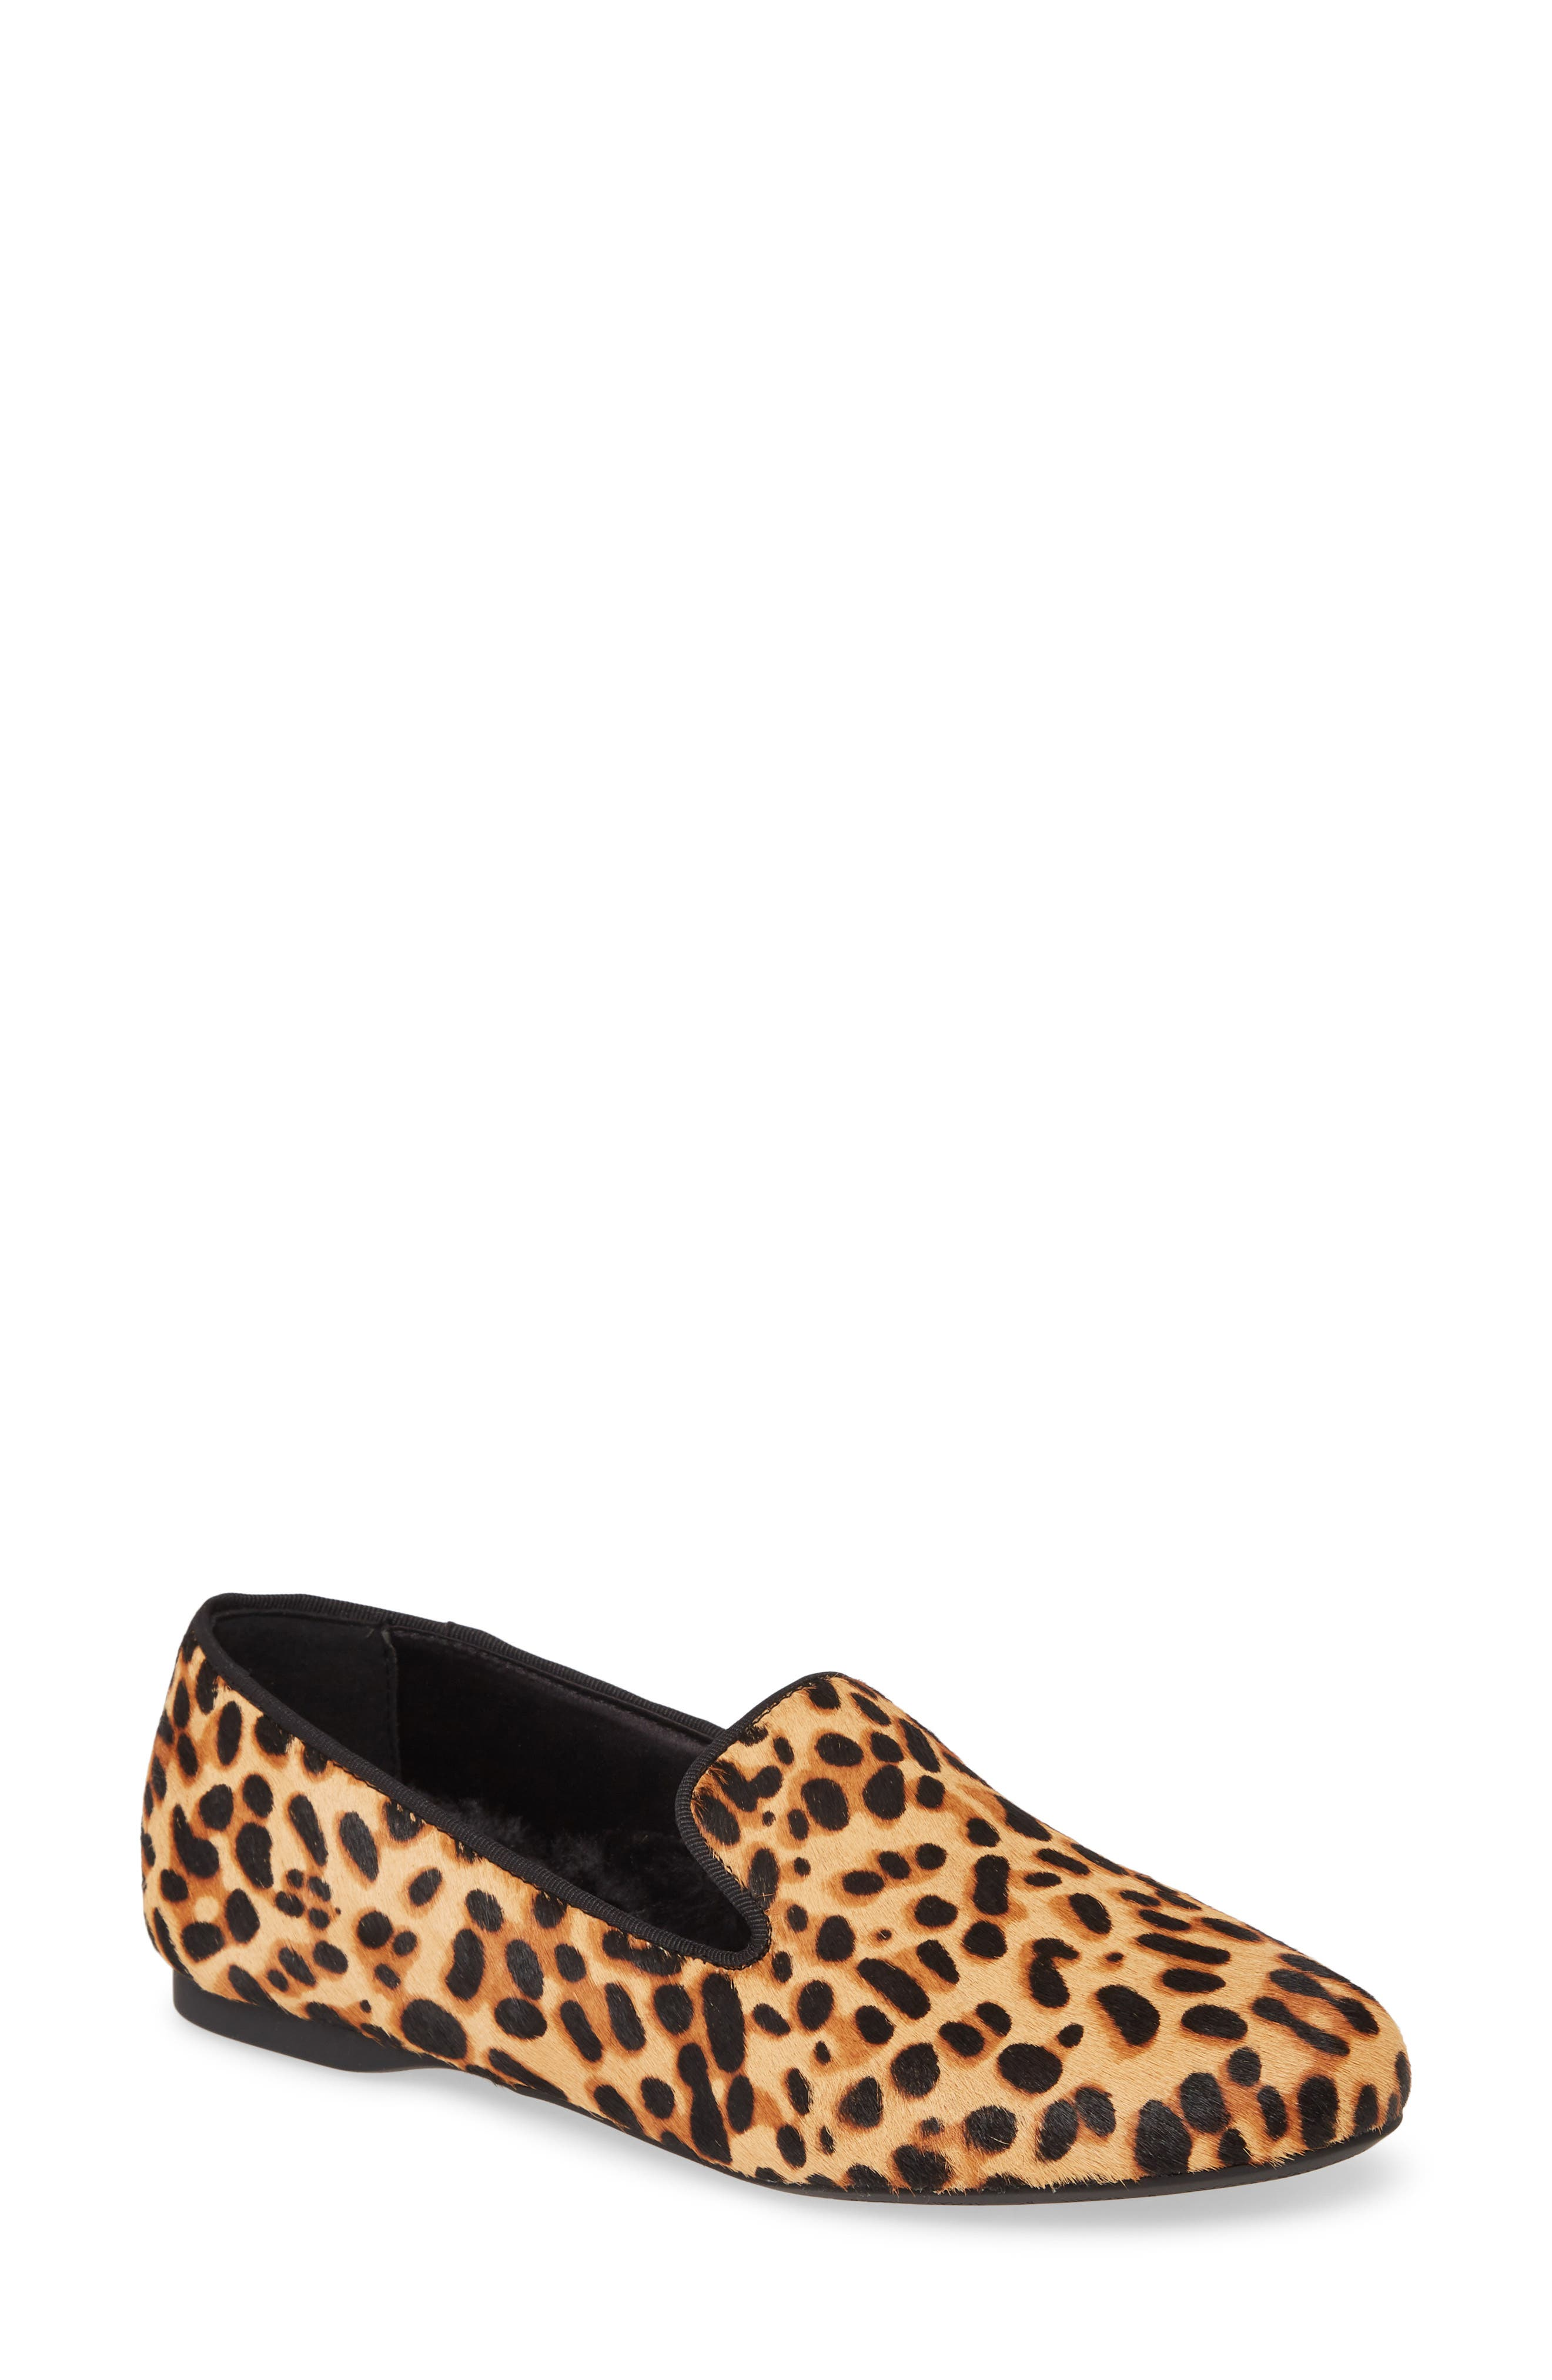 Birdies Starling Faux-Fur Lined Genuine Calf Hair Loafer (Women)